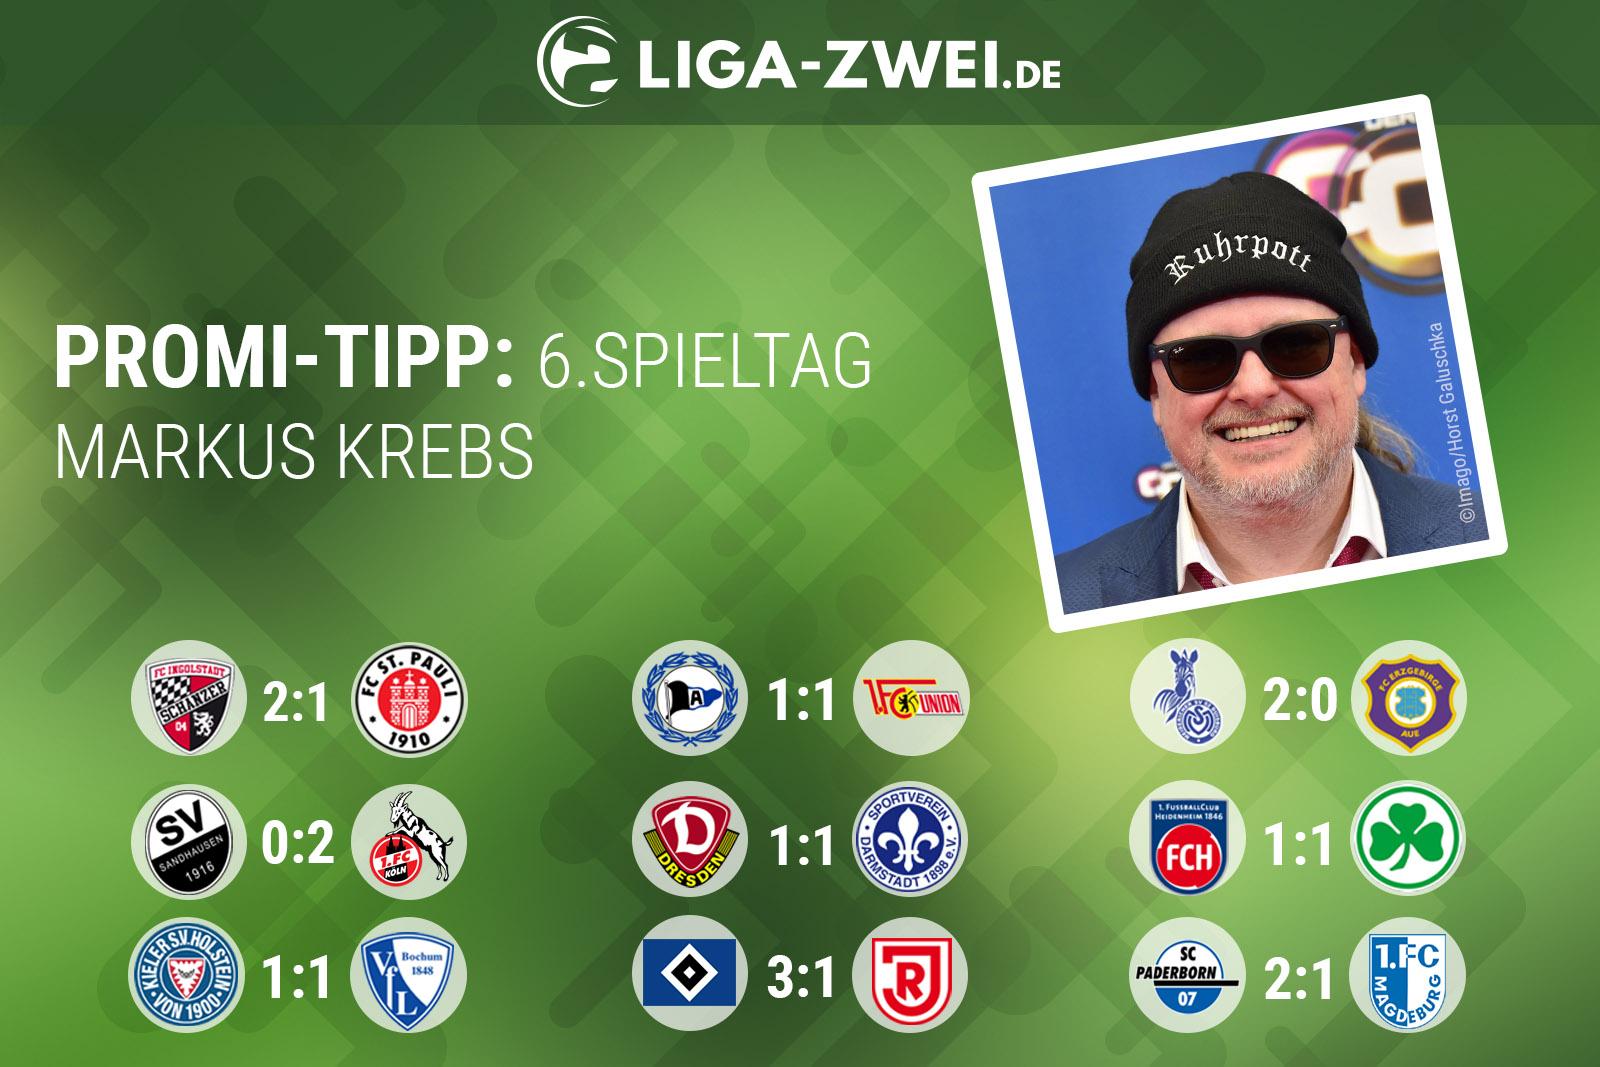 Markus Krebs beim Liga-Zwei.de Promi-Tipp